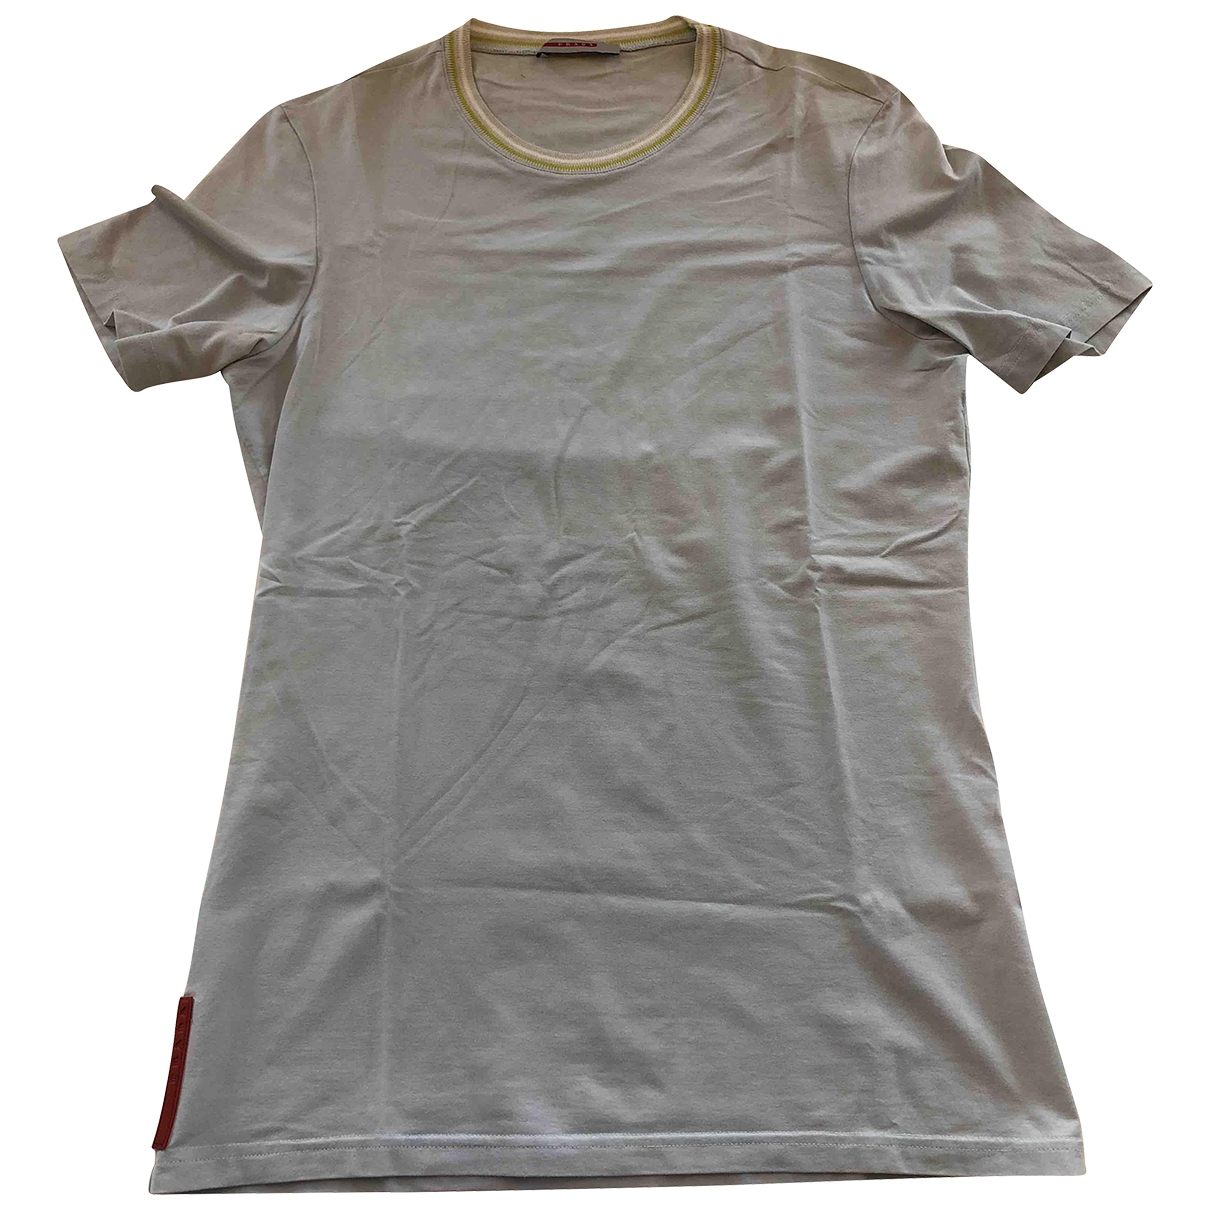 Prada \N Turquoise Cotton T-shirts for Men S International